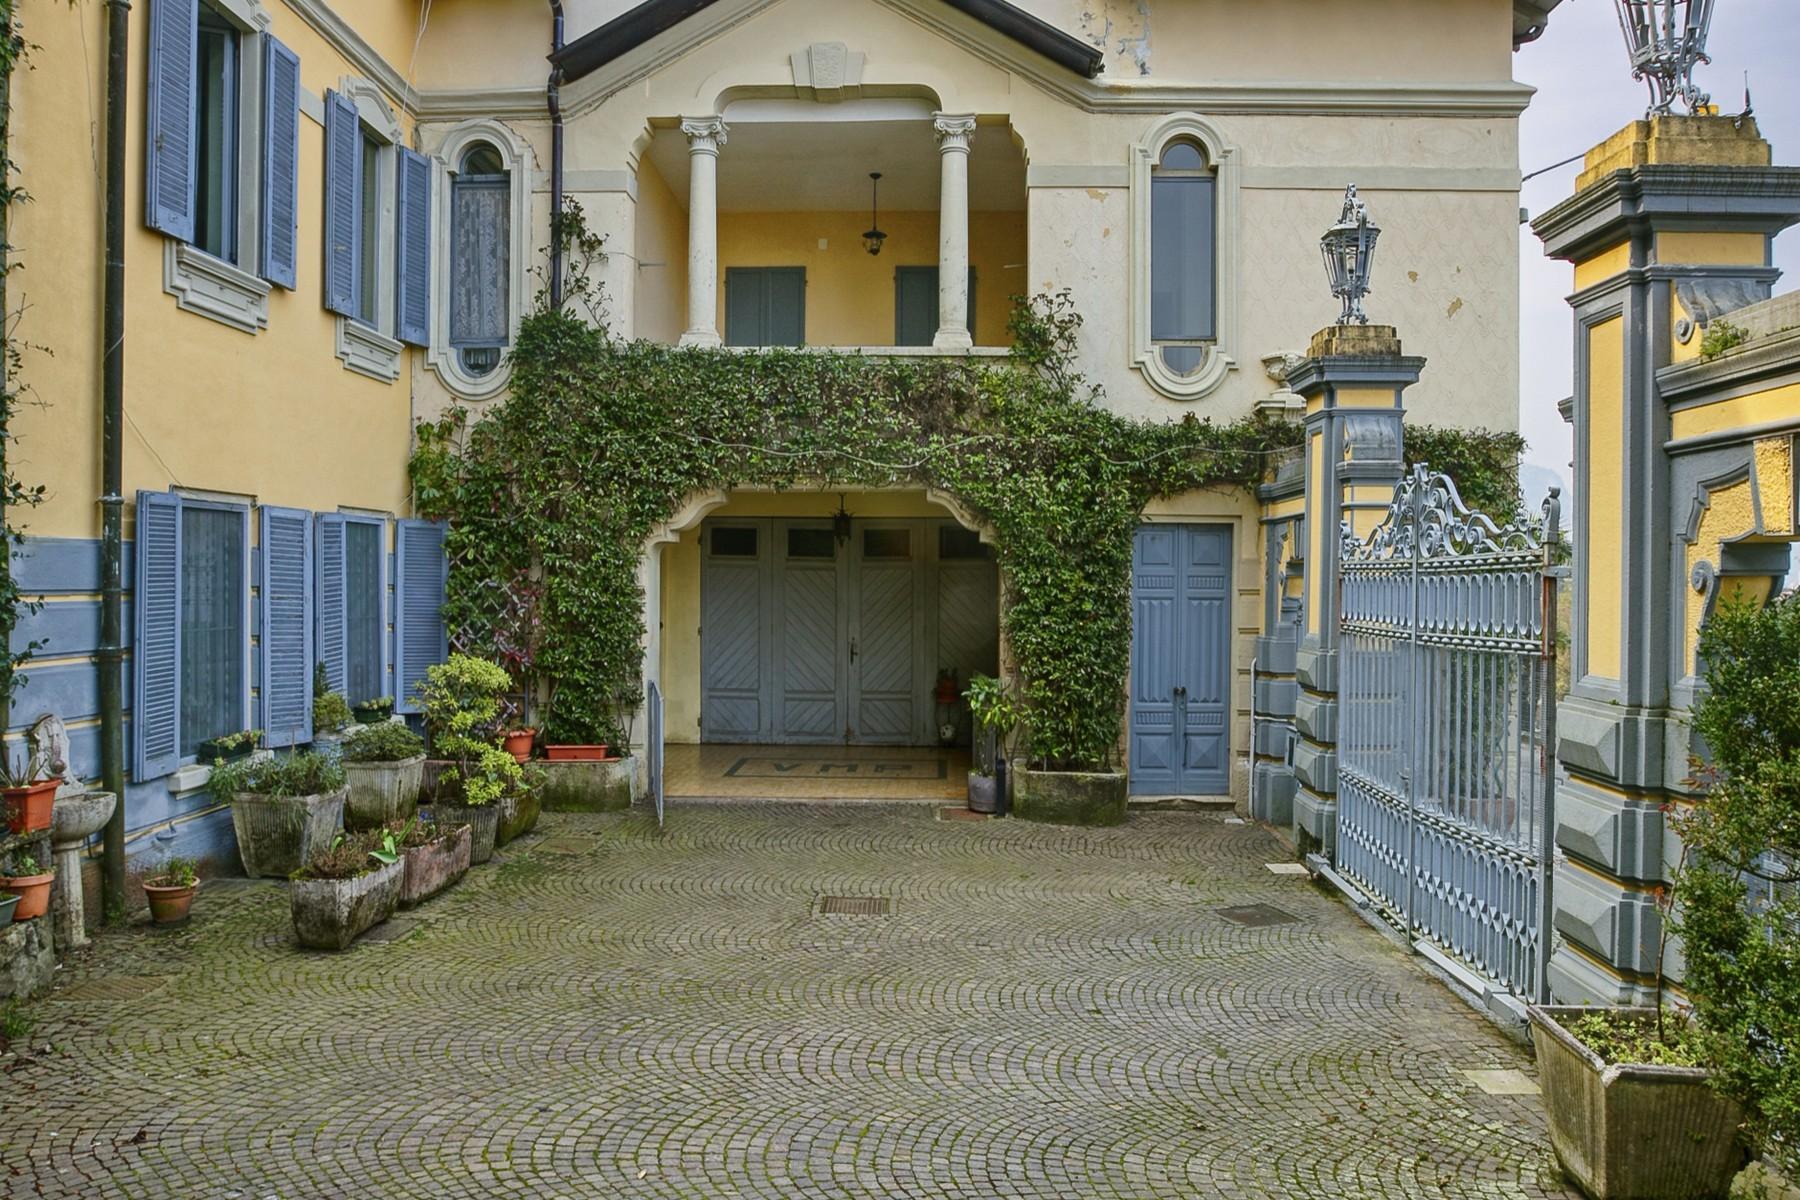 久负盛名的别墅享有Lago Maggiore湖景风光 - 5